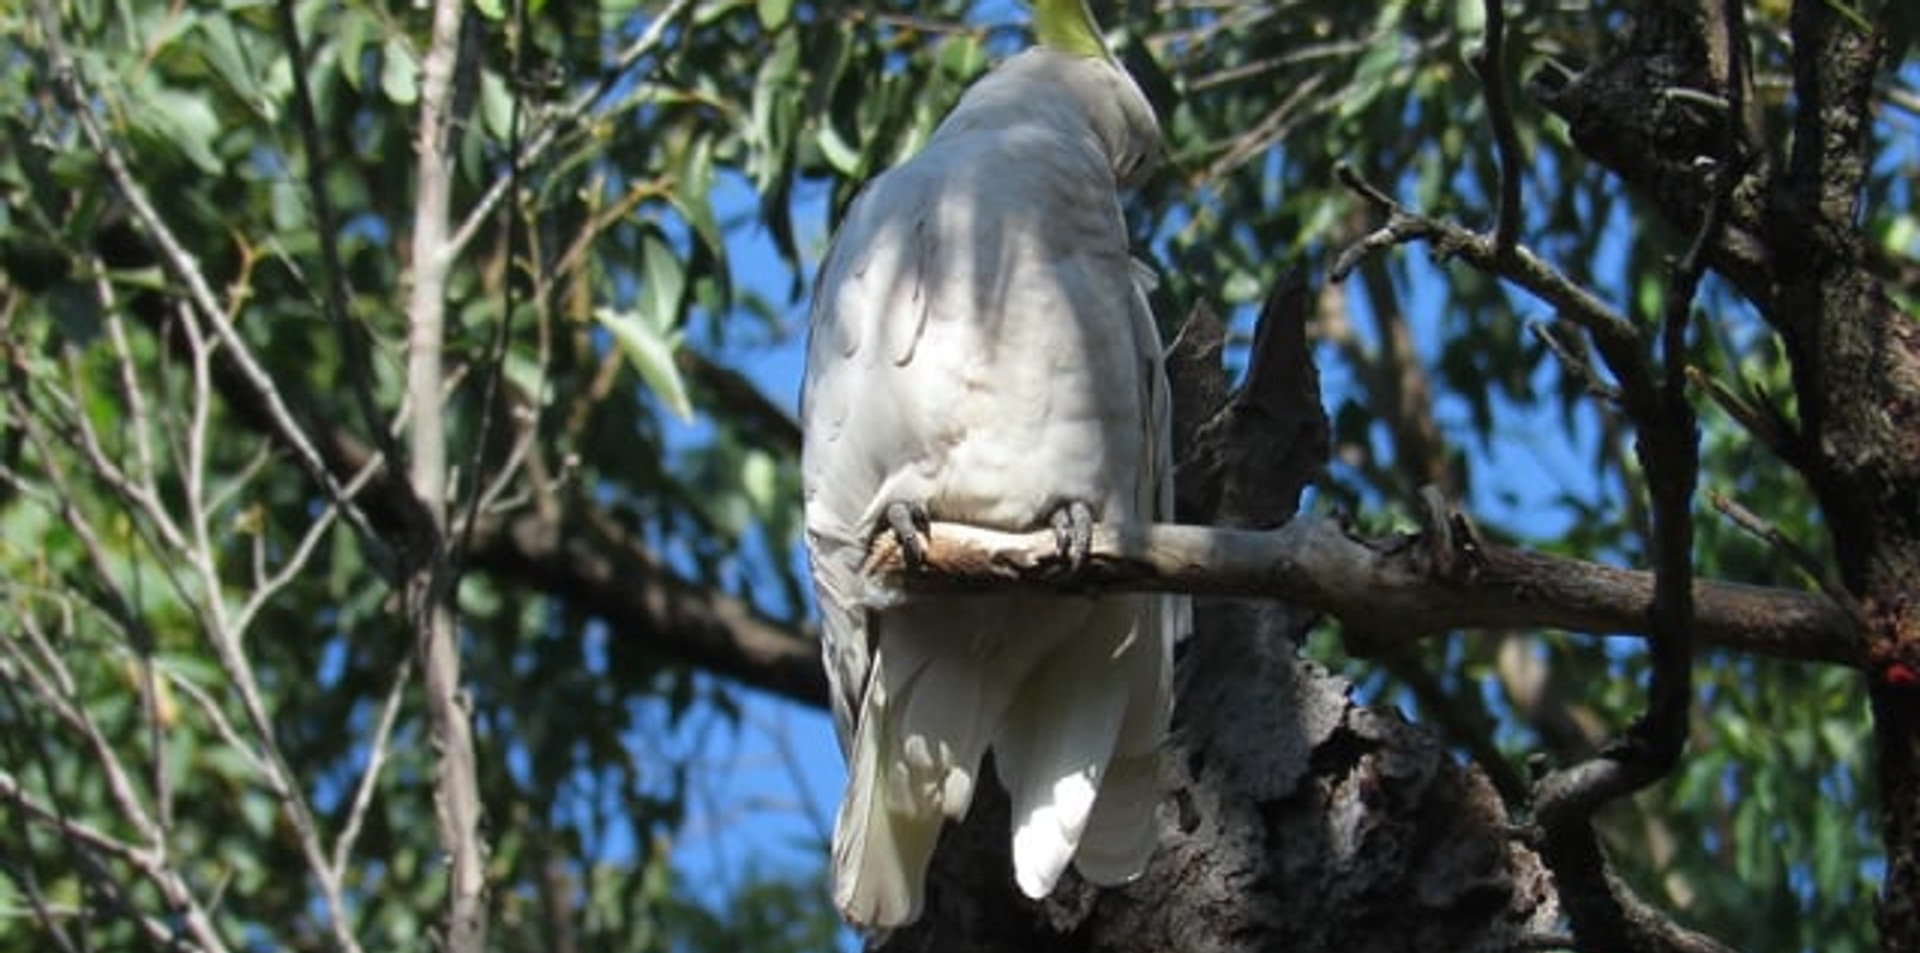 Sulphur-crested Cockatoo preening